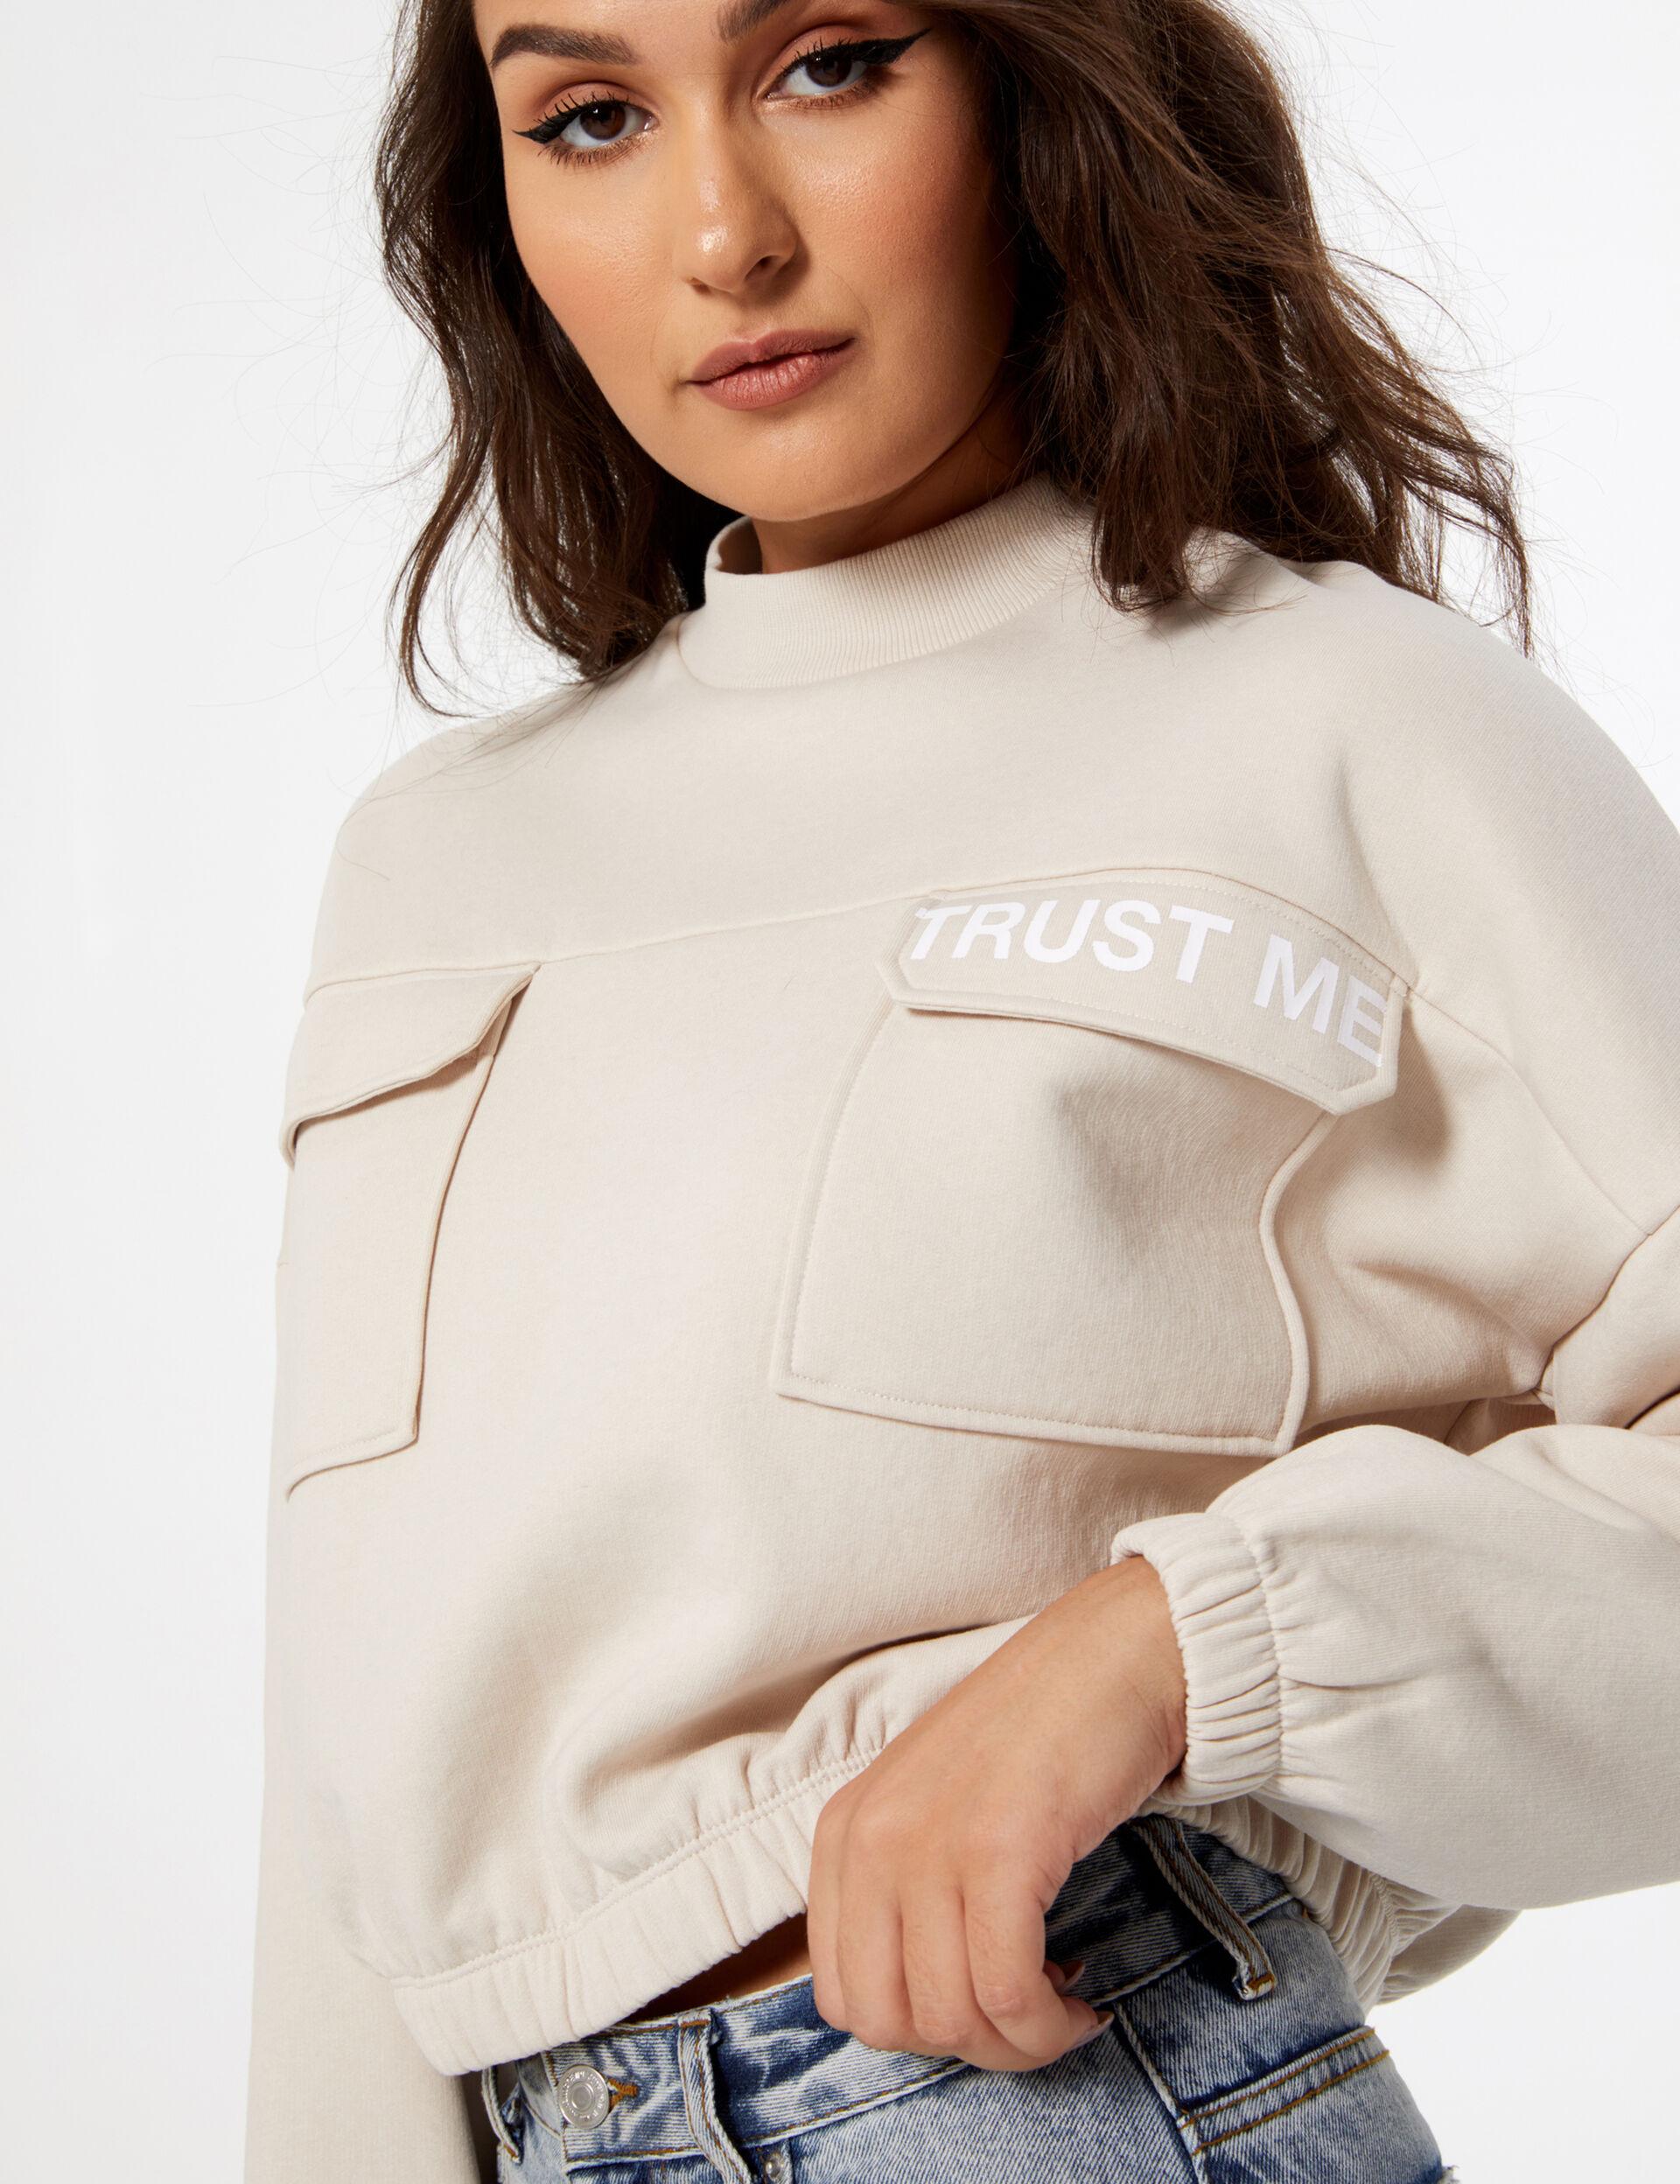 The x doll beauty sweatshirt